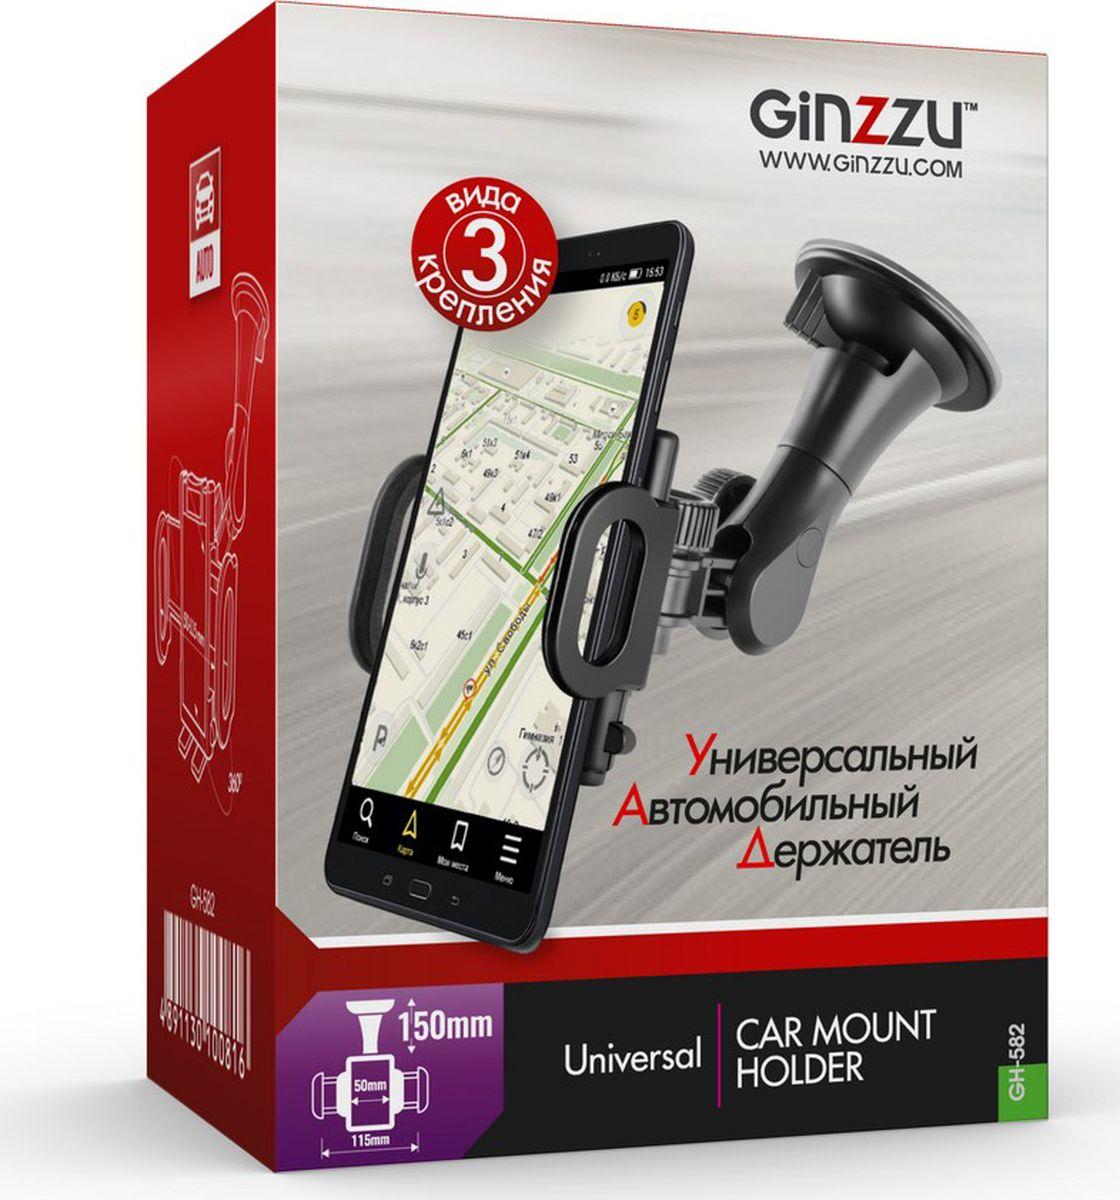 "Ginzzu GH-582 автомобильный держатель для устройств до 7,9"" GH-582"